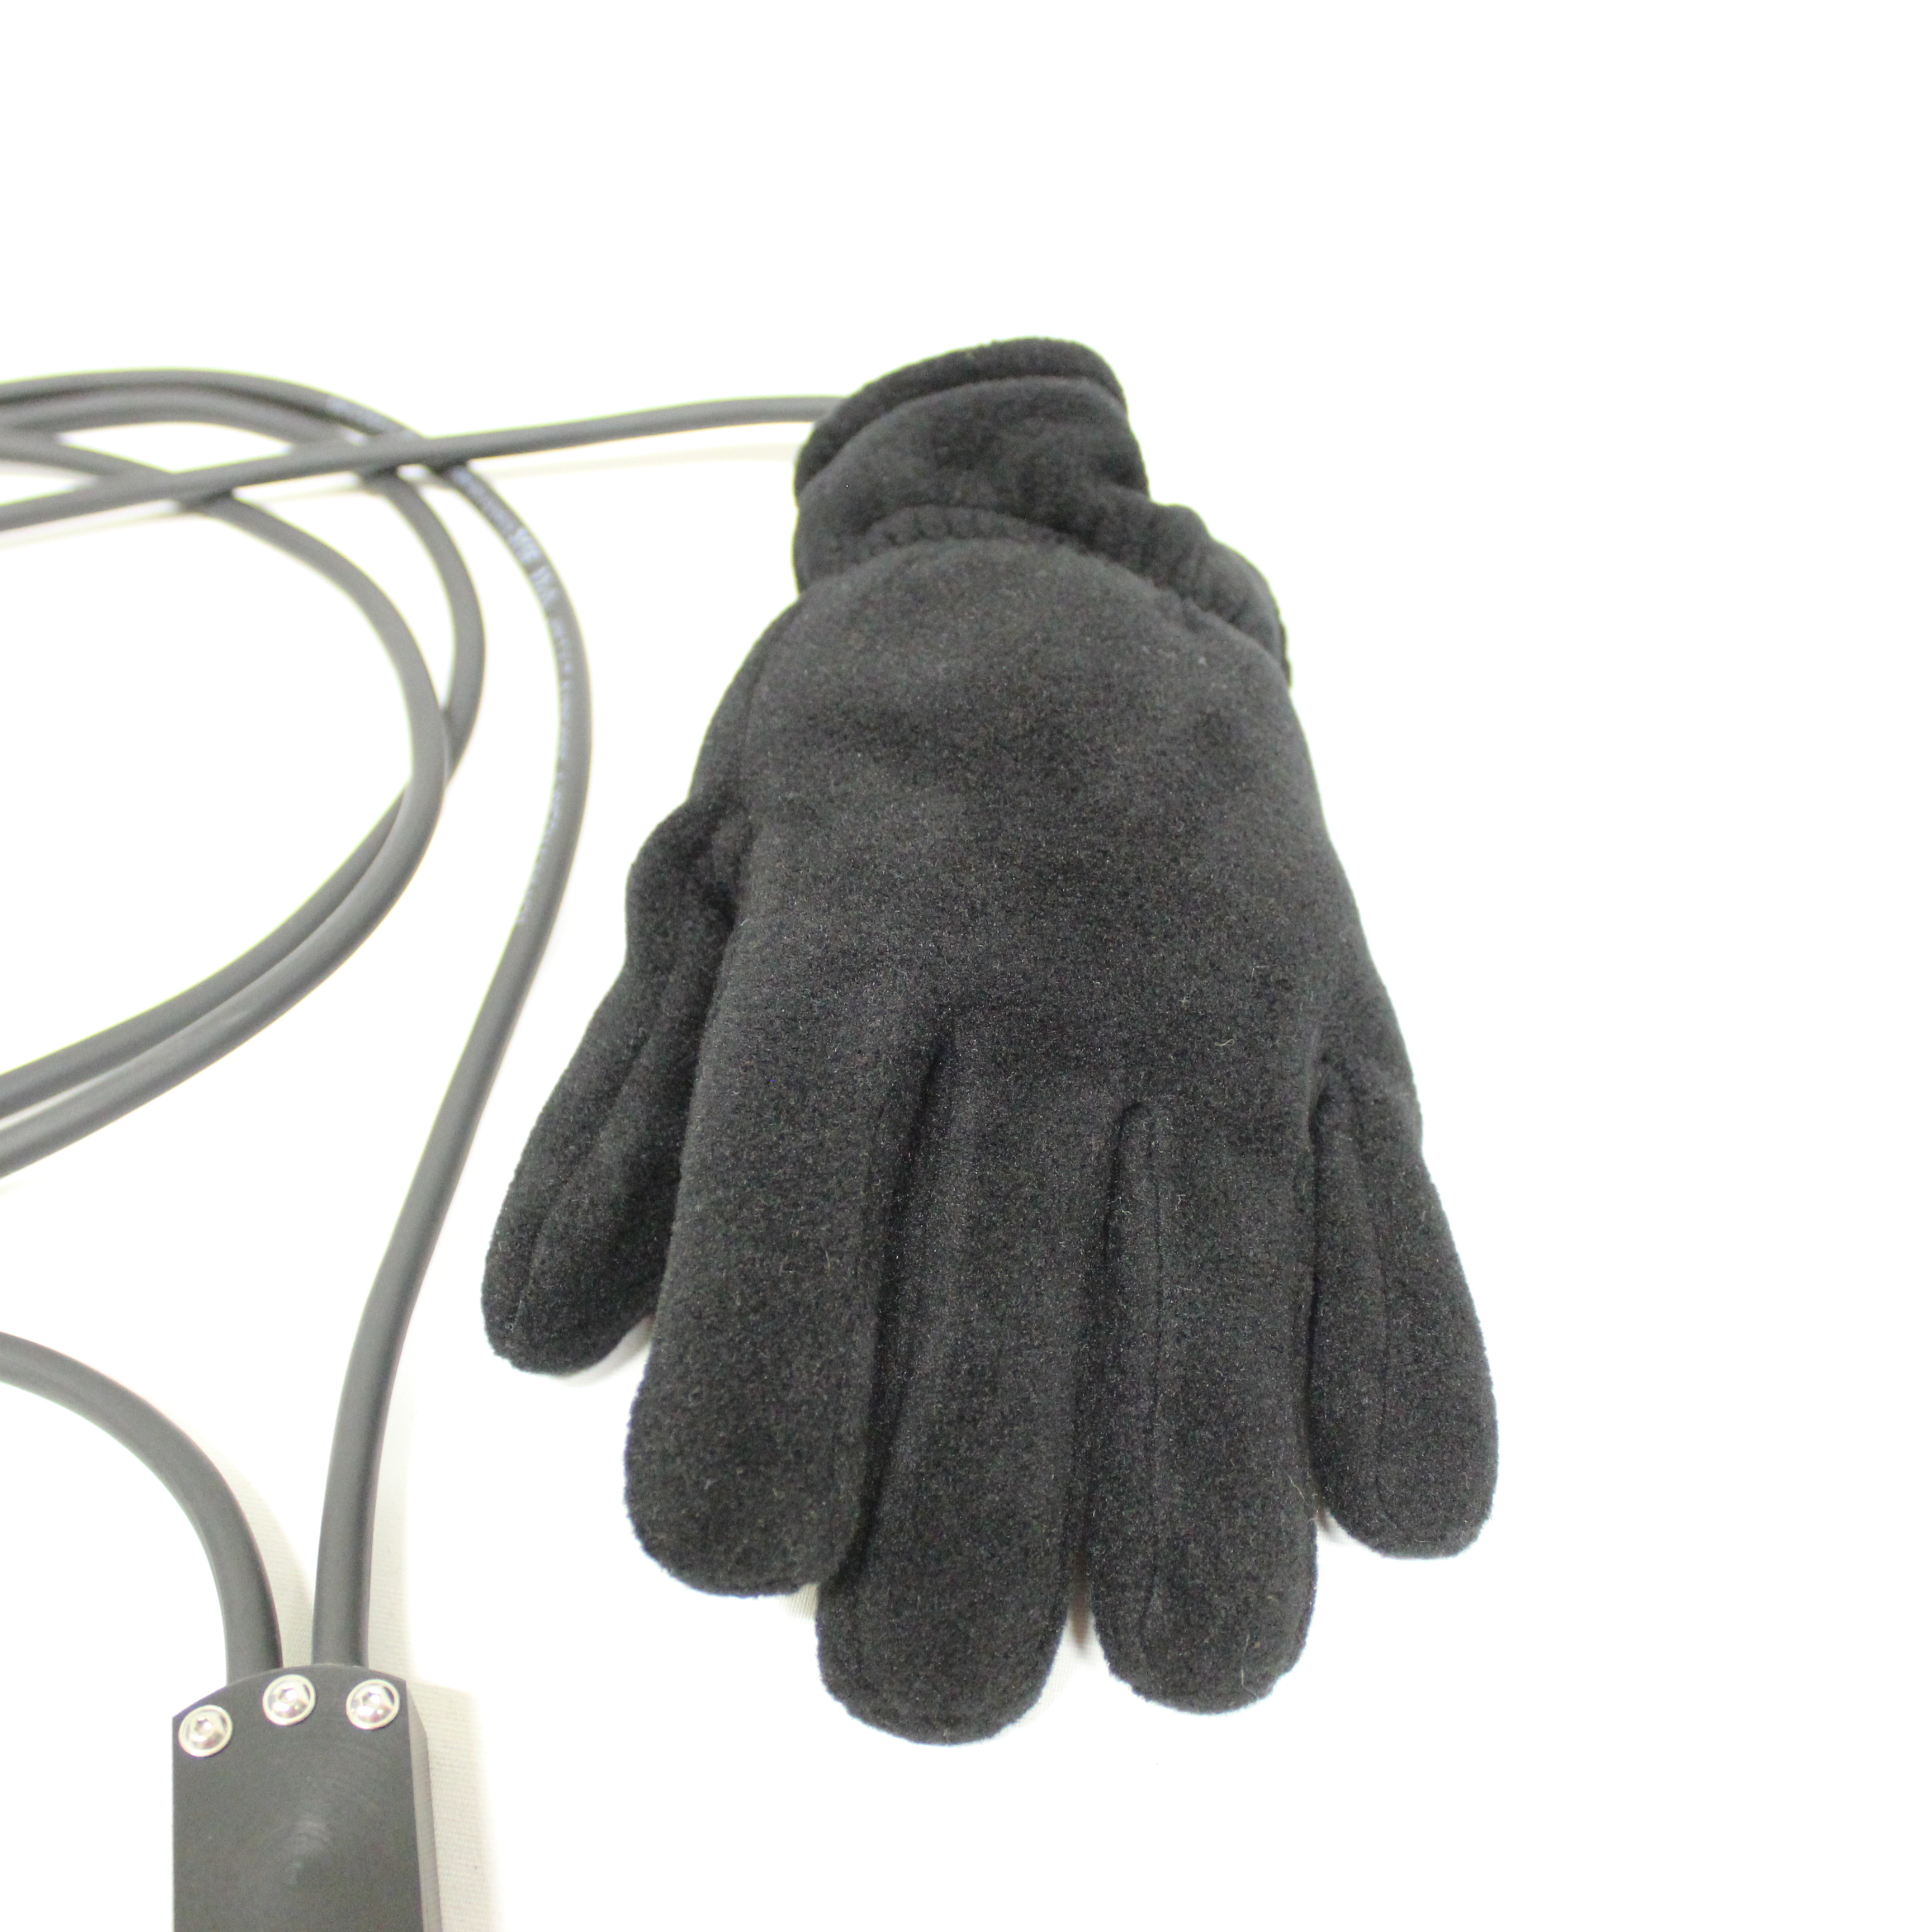 Yellow Diving Beheizte Unterzieh-Handschuhe Gr. XL